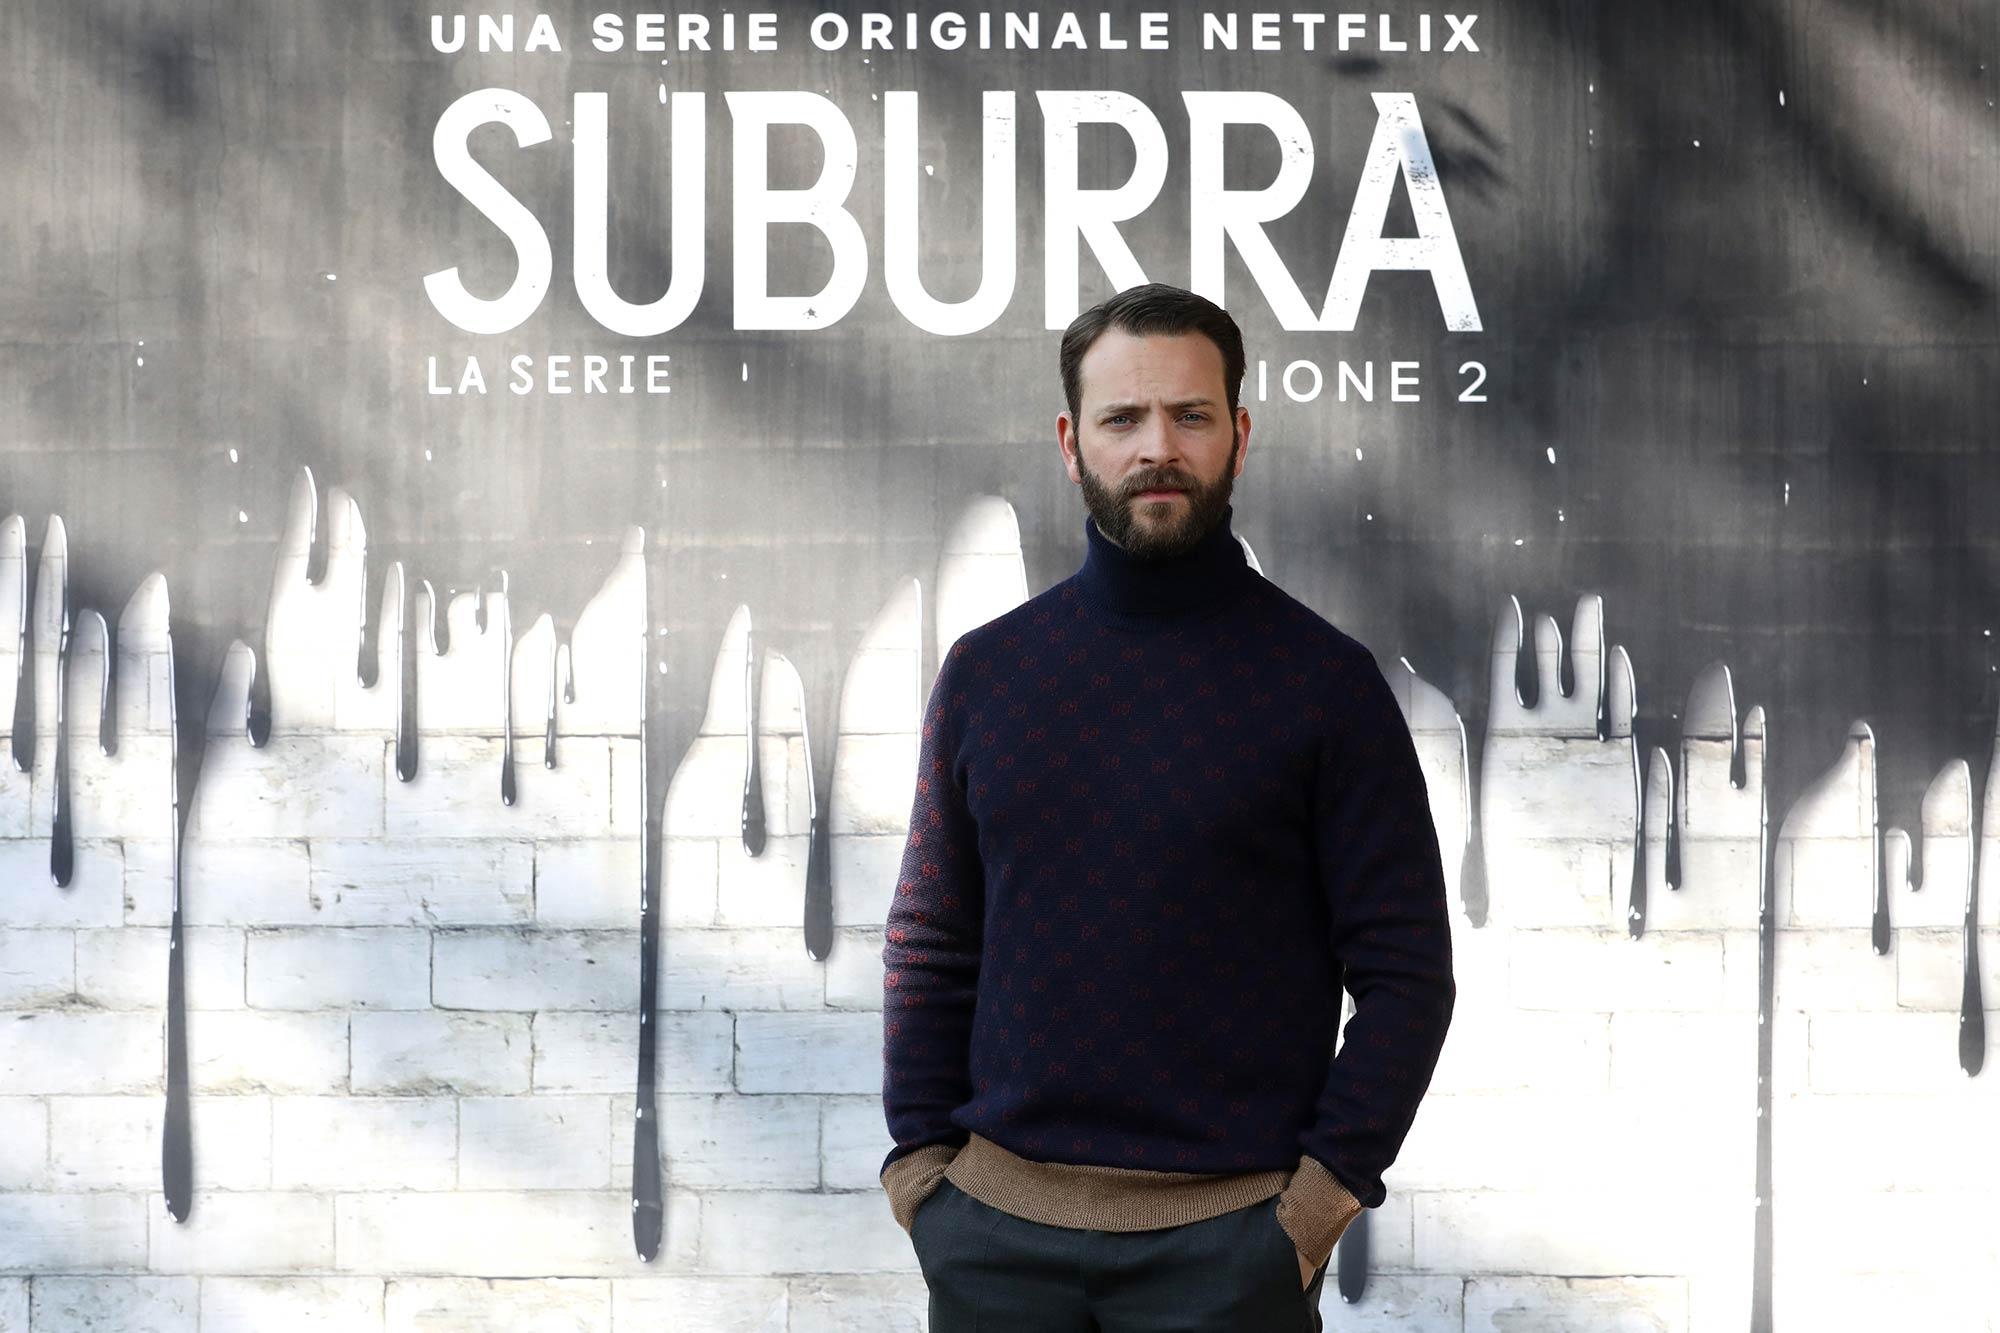 Netflix Premiere Suburra 2 - Alessandro Borghi - Grooming Massimo Serini Team